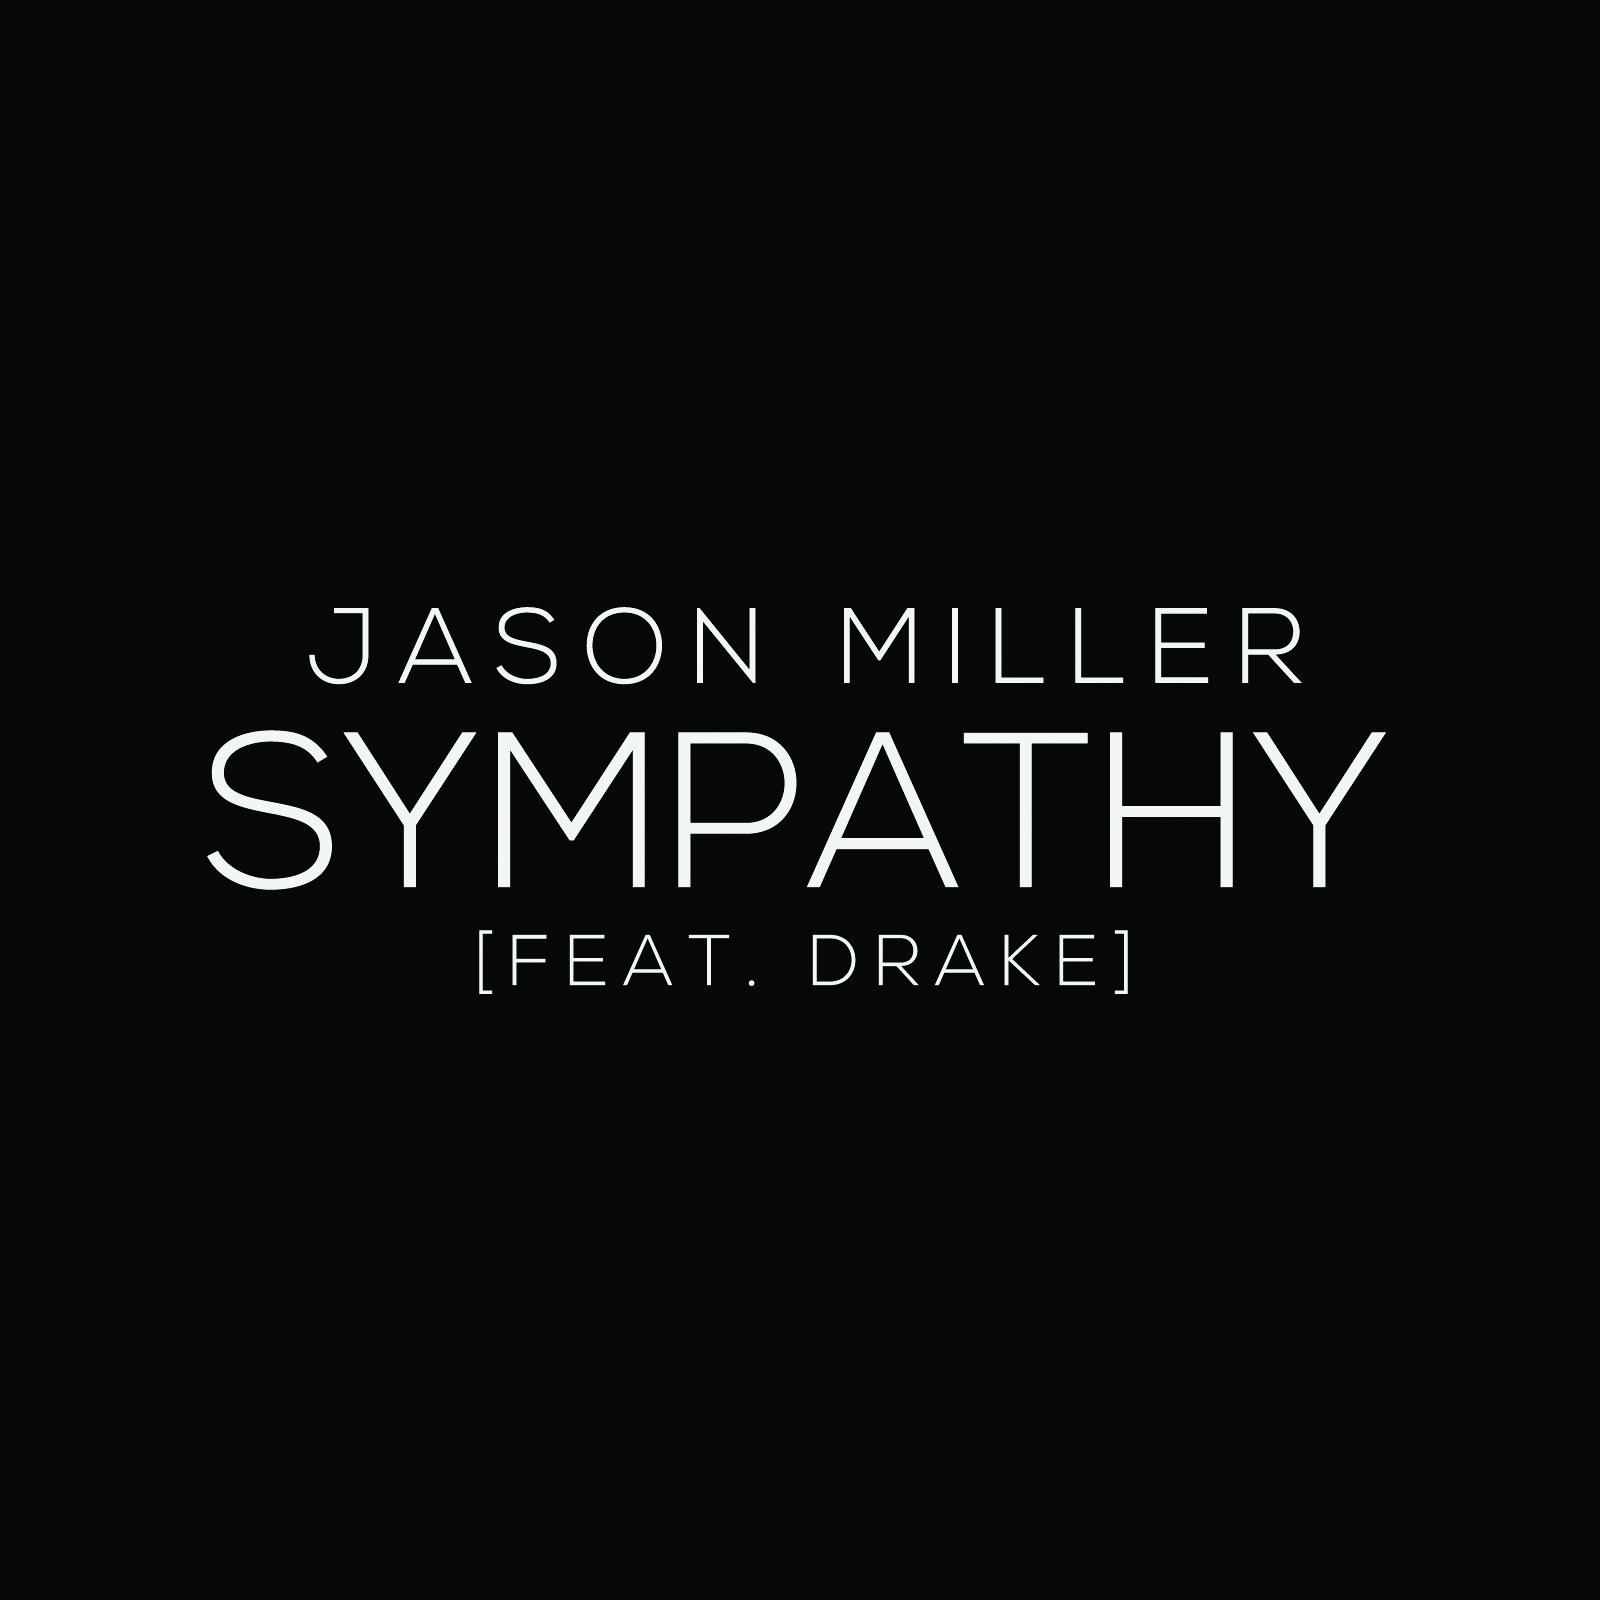 jm-sympathy-alt-CMYK